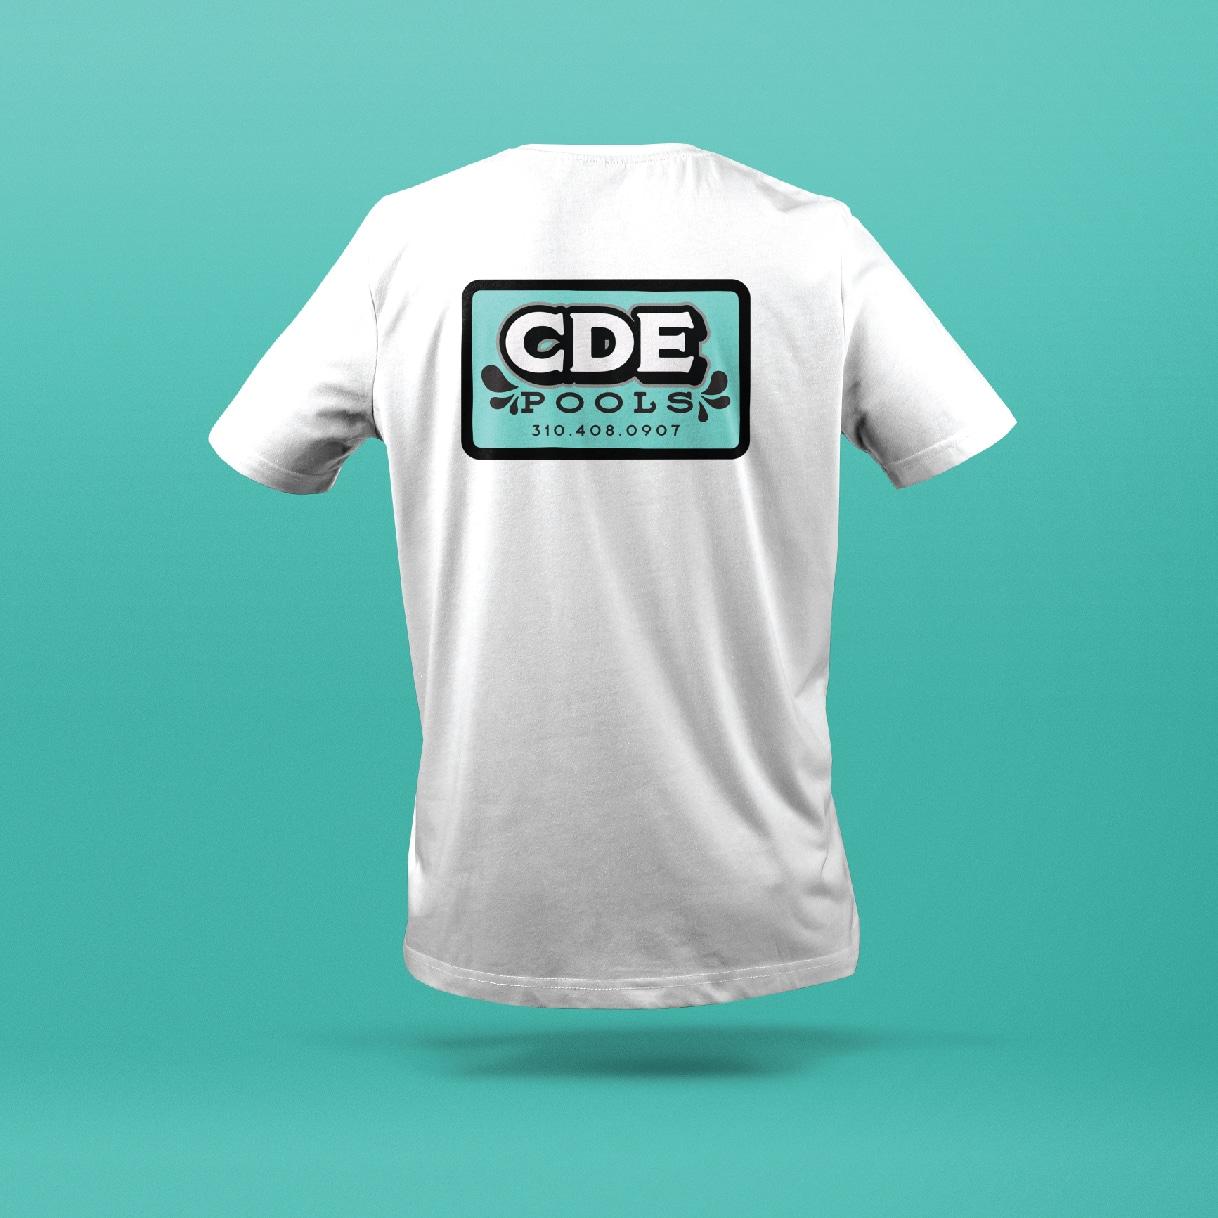 CDE_Logos_By_Stellen_Design_Profile-02